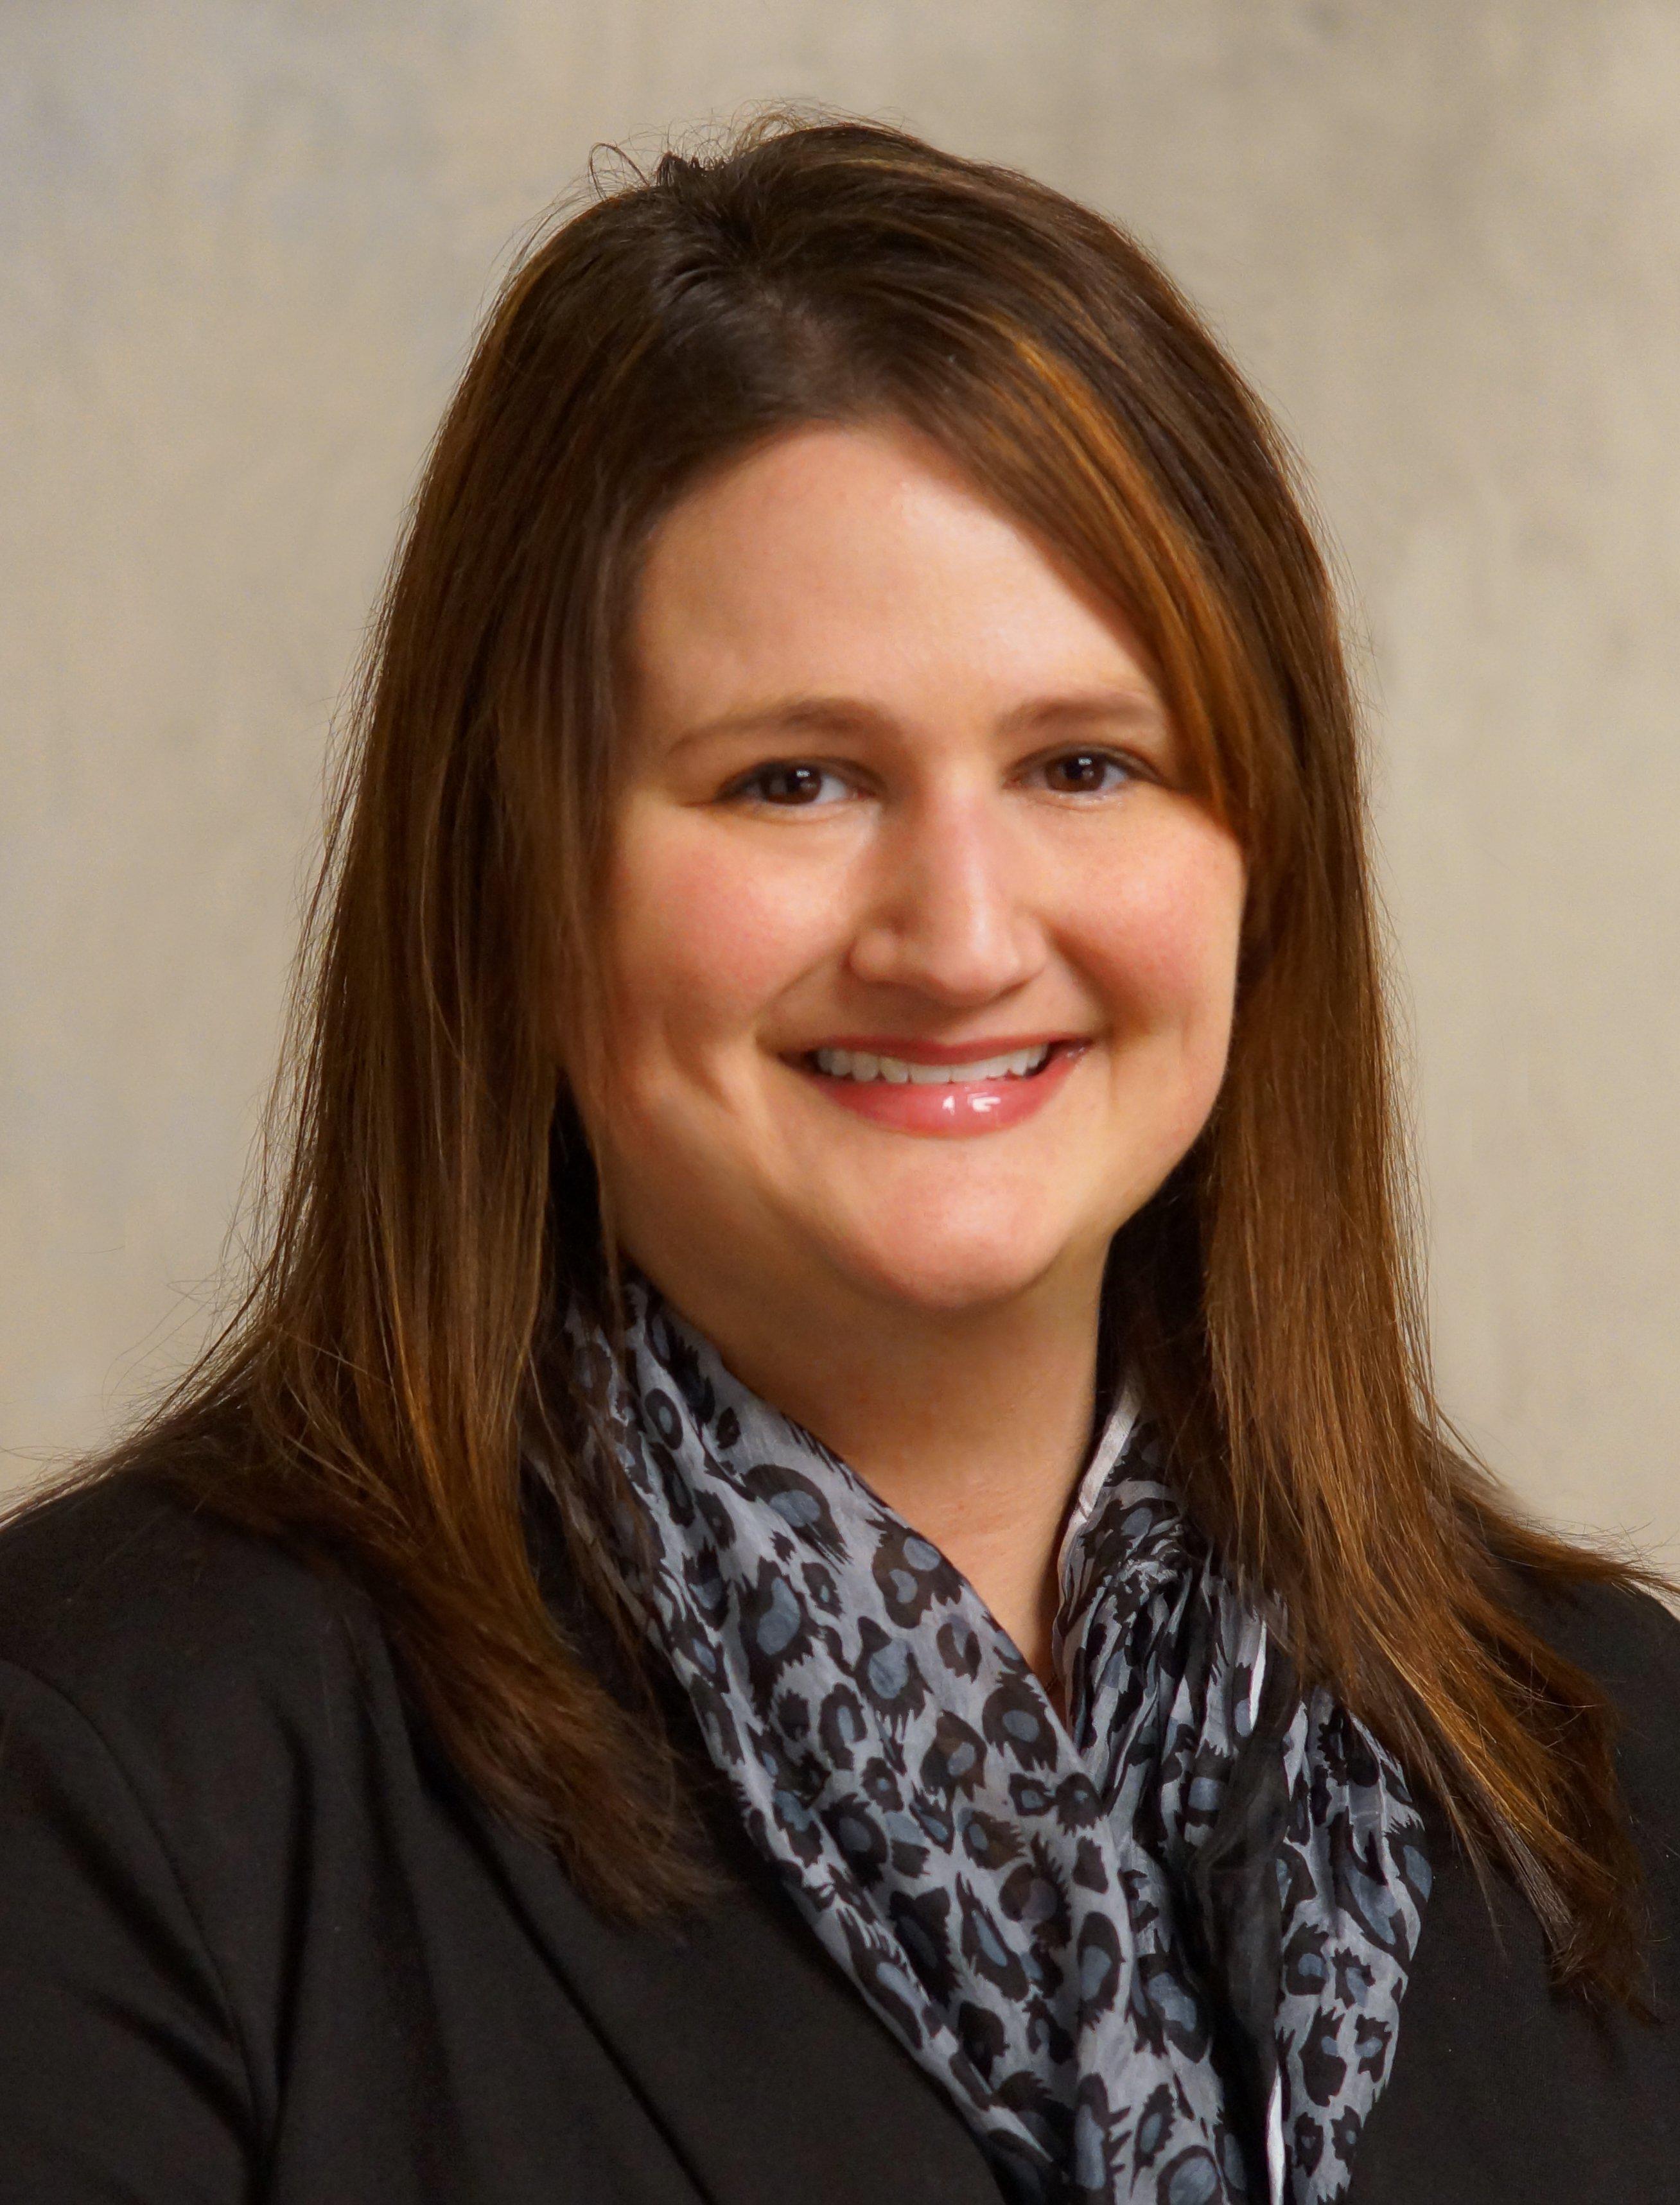 Therapist & Pregnancy Counselor Machaela Hackendahl